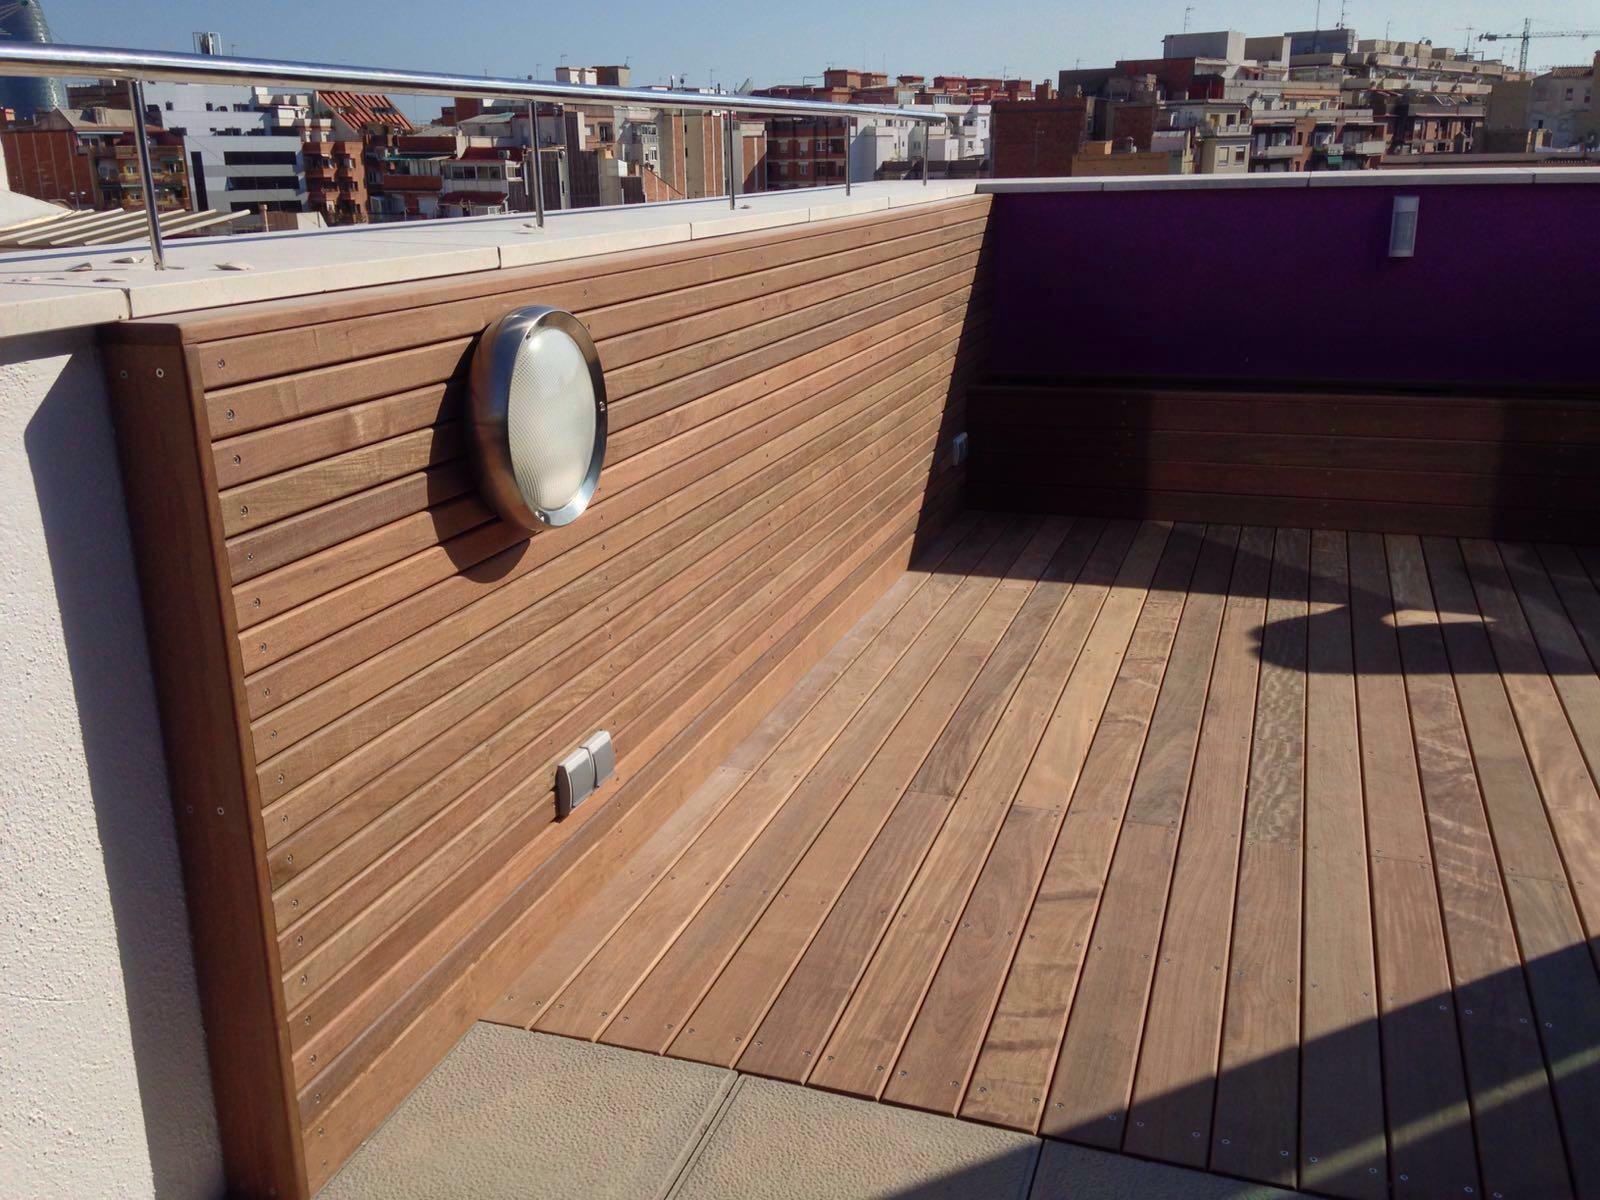 Decoradores barcelona stunning imgwajpg with decoradores - Decoradores de interiores barcelona ...